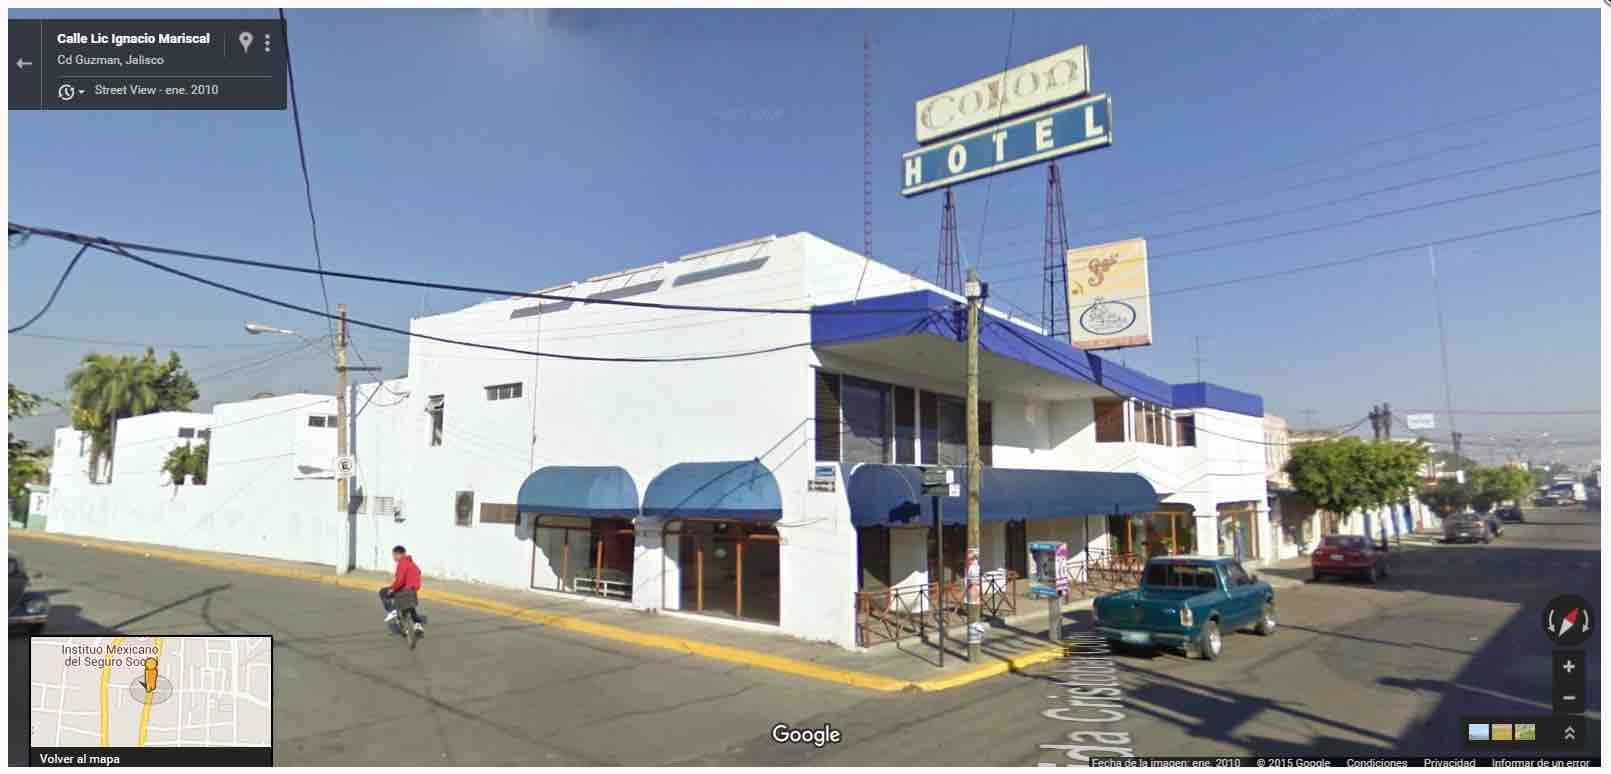 Royal Motel, Hotel Colon; Av. Colon 655, Ciudad Guzman, Jalisco